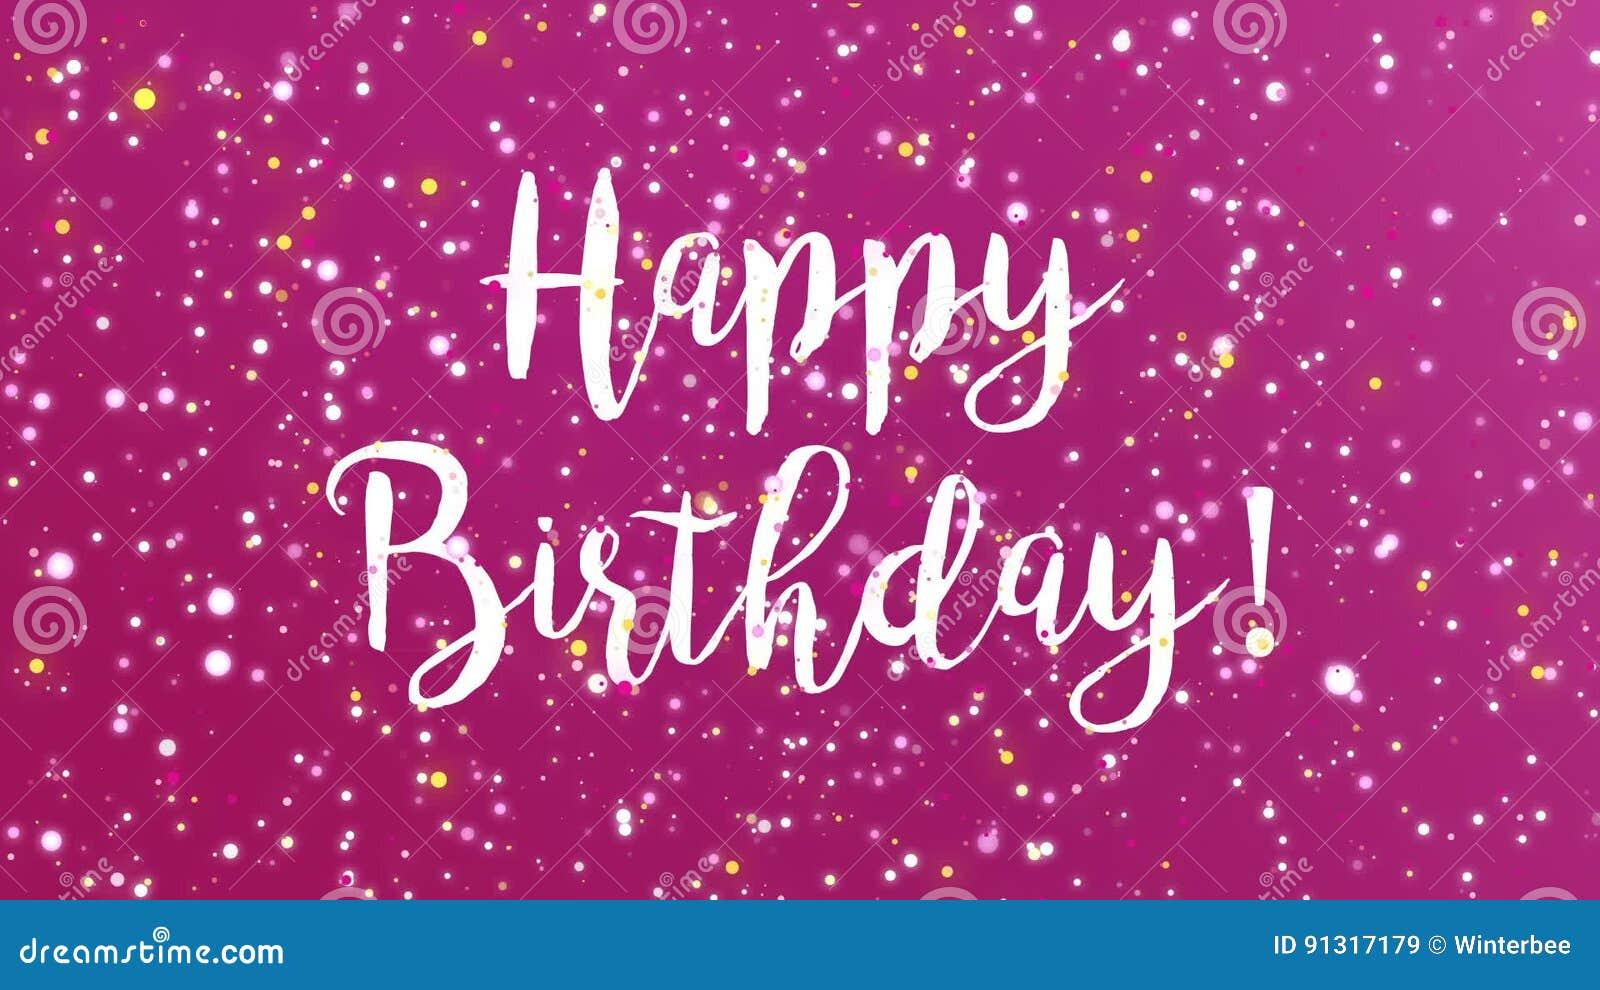 Sparkly Purple Happy Birthday Greeting Card Video Video – Happy Birthday Card Video